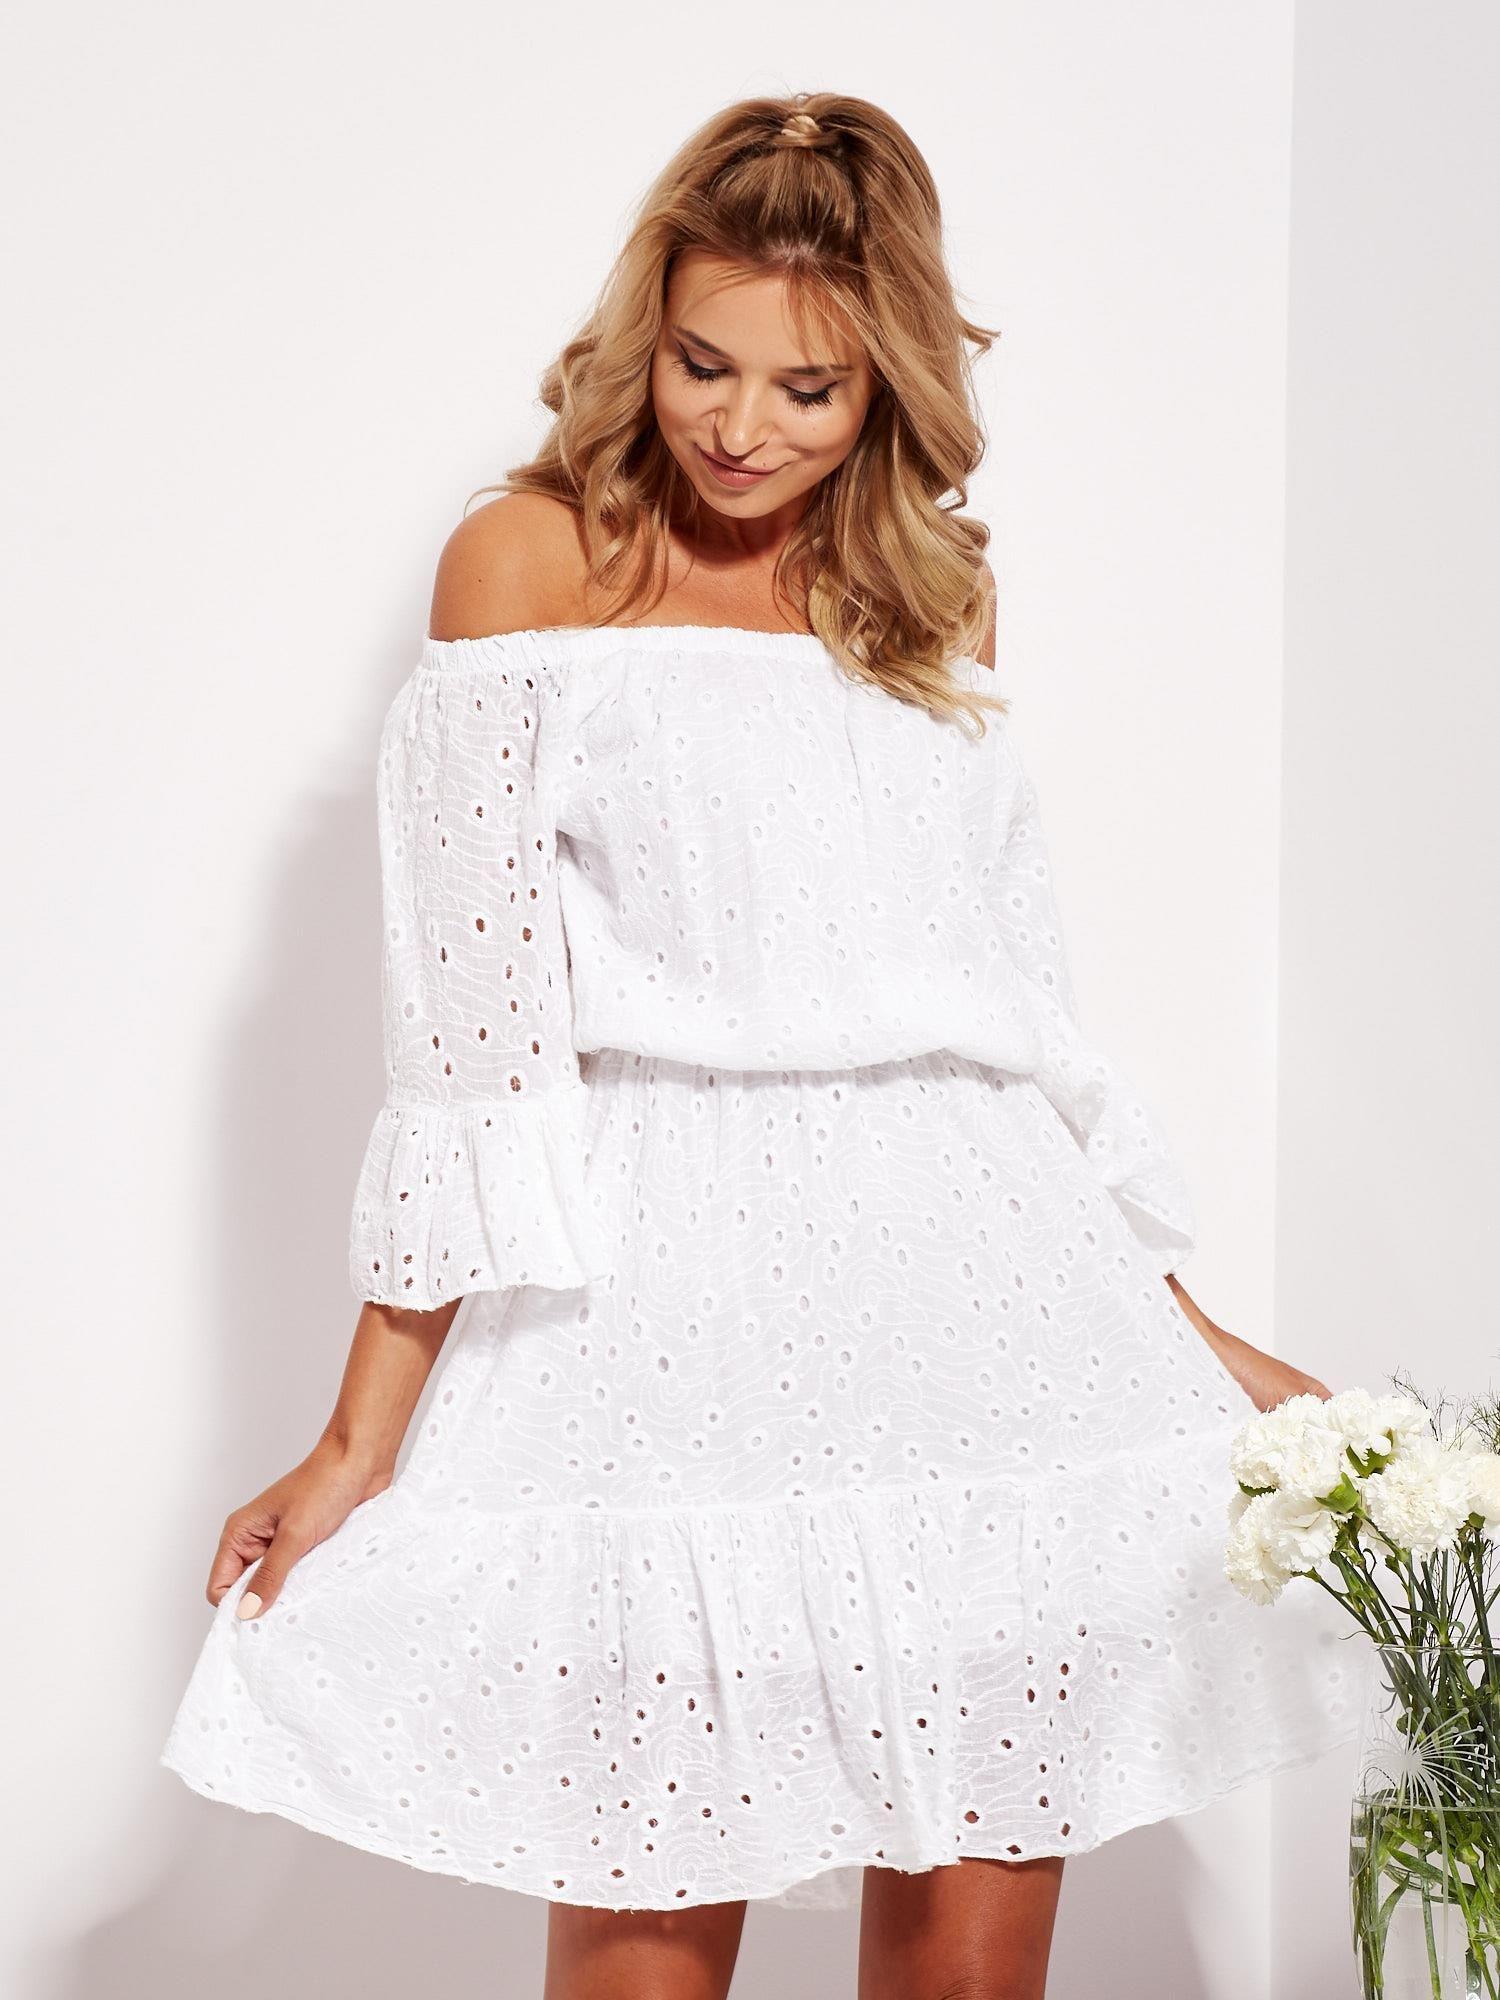 7845de097d Biała rozkloszowana sukienka hiszpanka z haftem - Sukienka hiszpanka ...